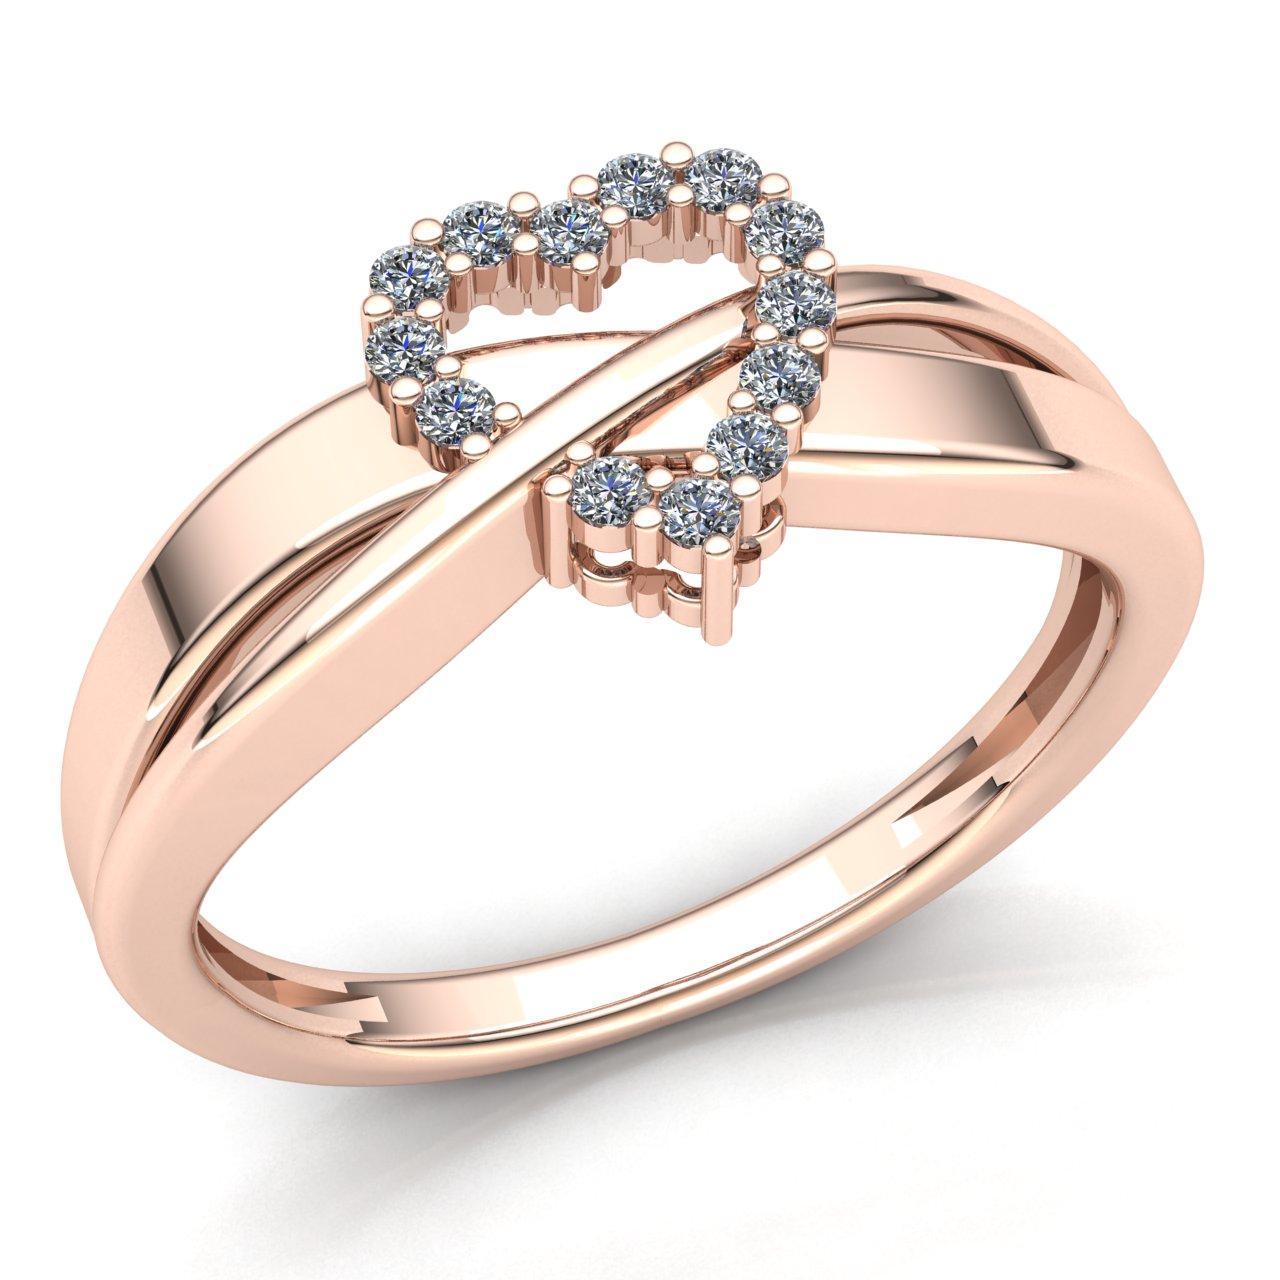 Genuine 0.2ct Round Cut Diamond Ladies Bridal Solitaire Engagement Ring 14K Gold